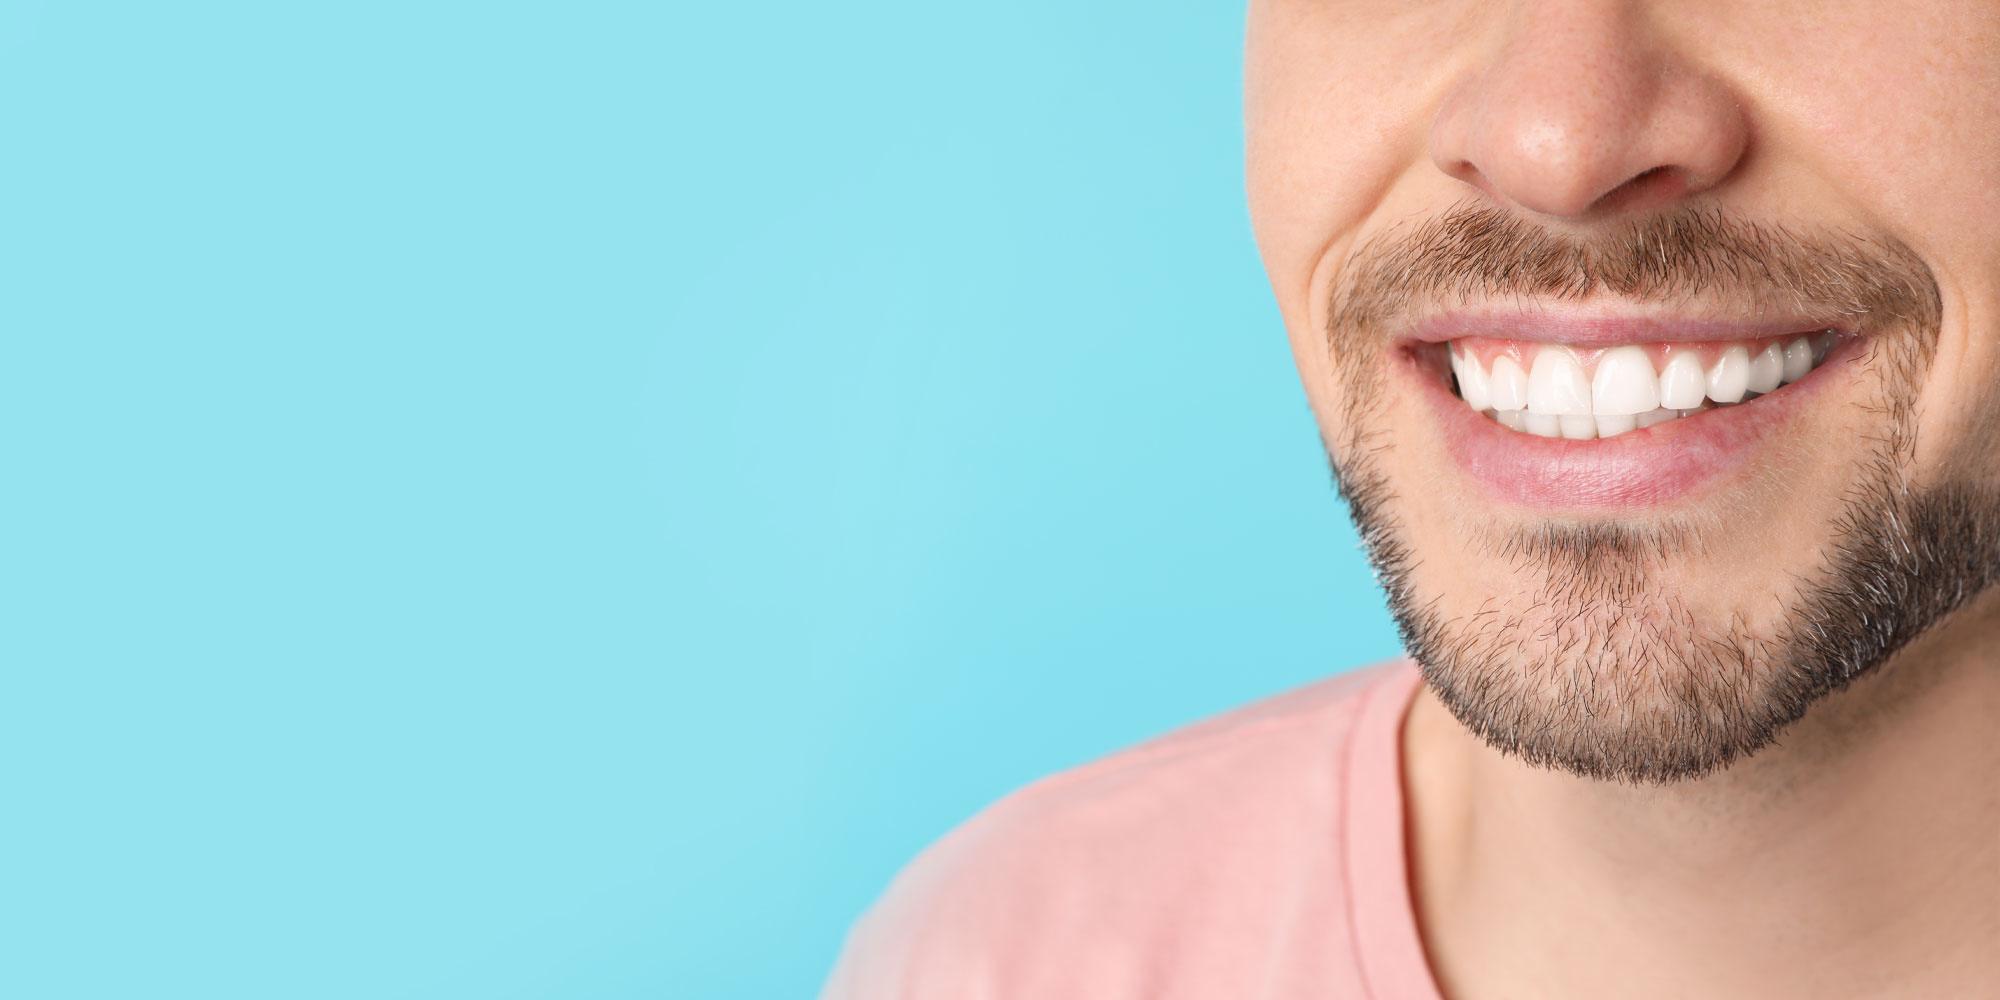 patient smiling after dental crowns procedure